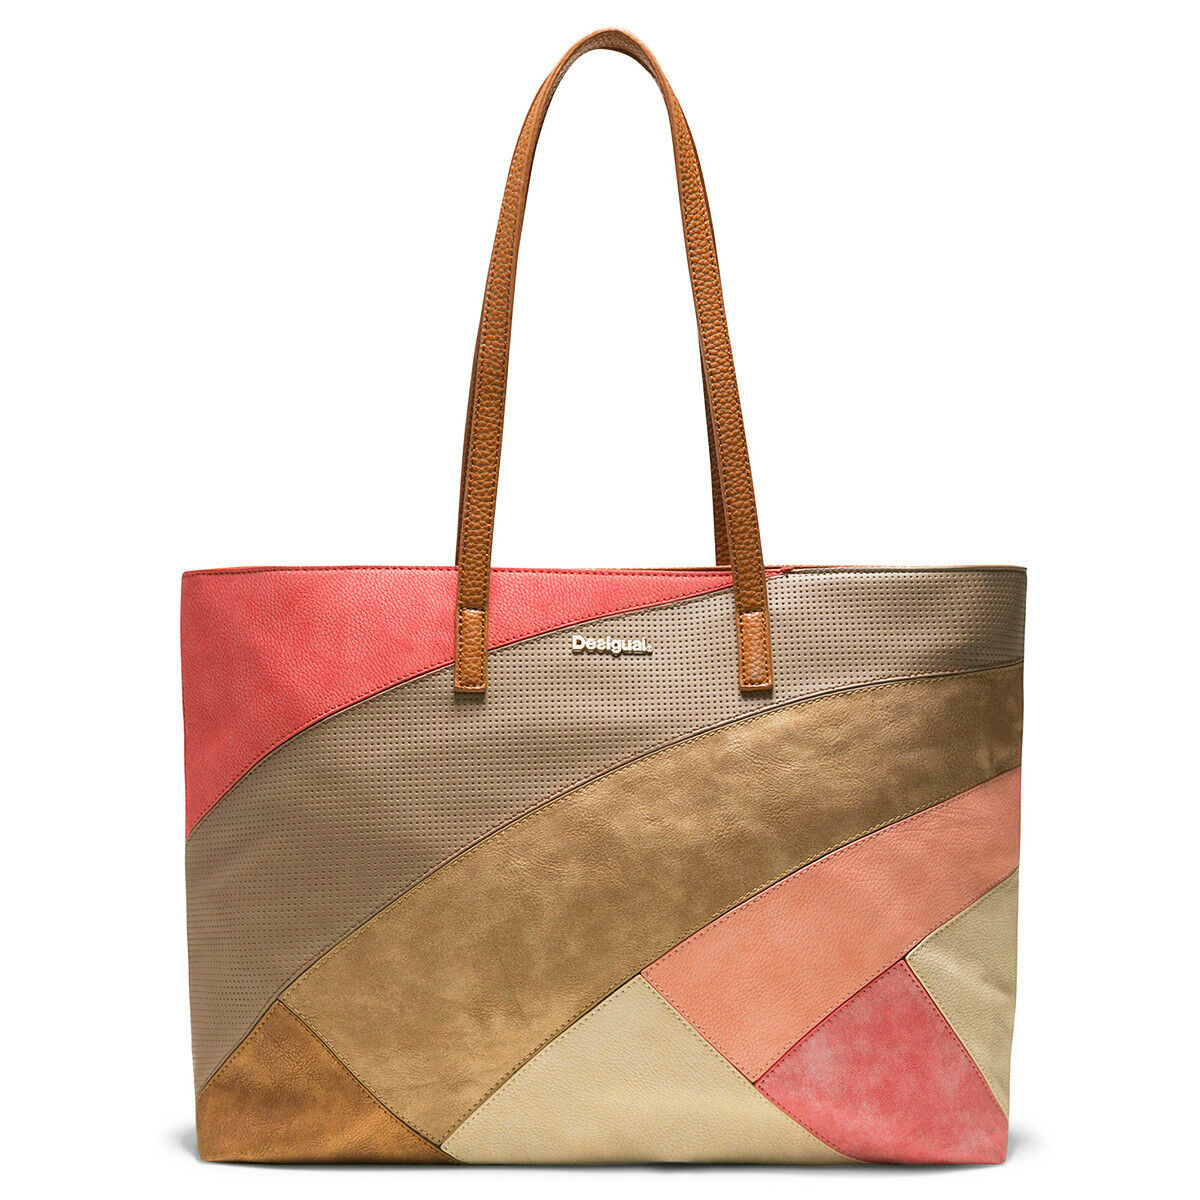 Desigual Shopper Handtasche Schultertasche Bols Caprica rotmond 18SAXPD7 18SAXPD7 18SAXPD7 | Abgabepreis  9eed6c